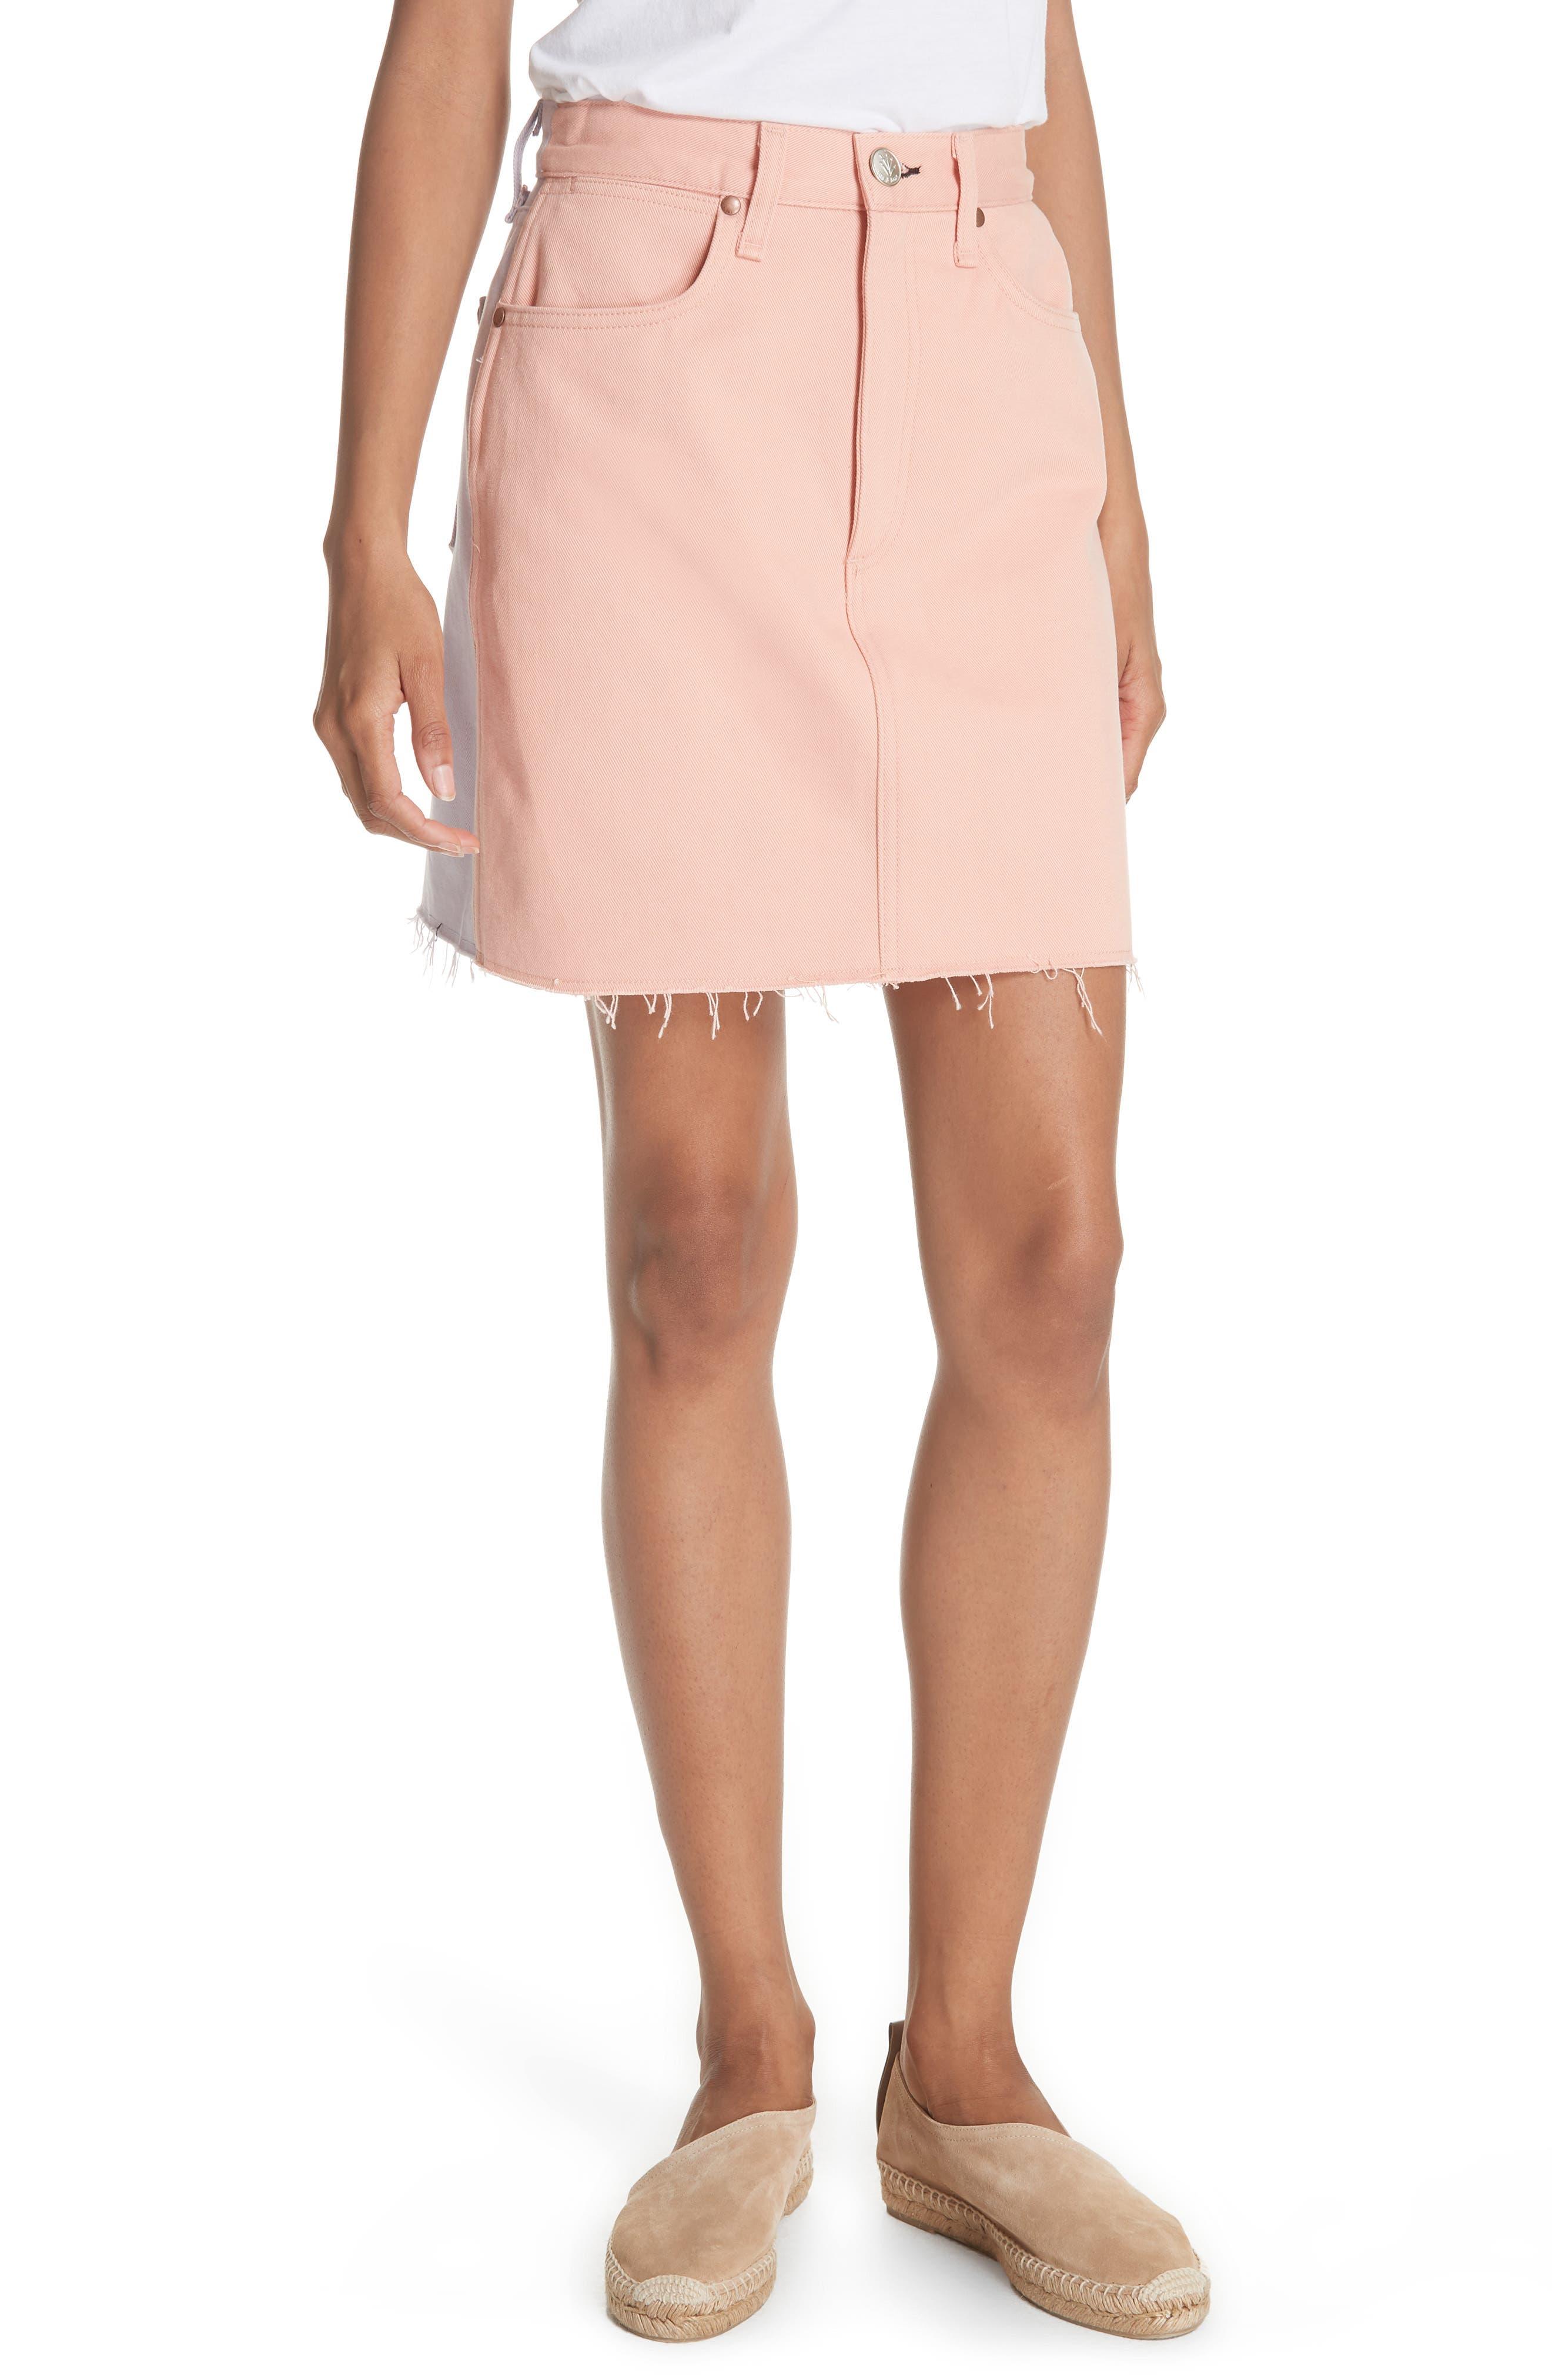 Moss Skirt,                             Main thumbnail 1, color,                             Peach/ Lilac